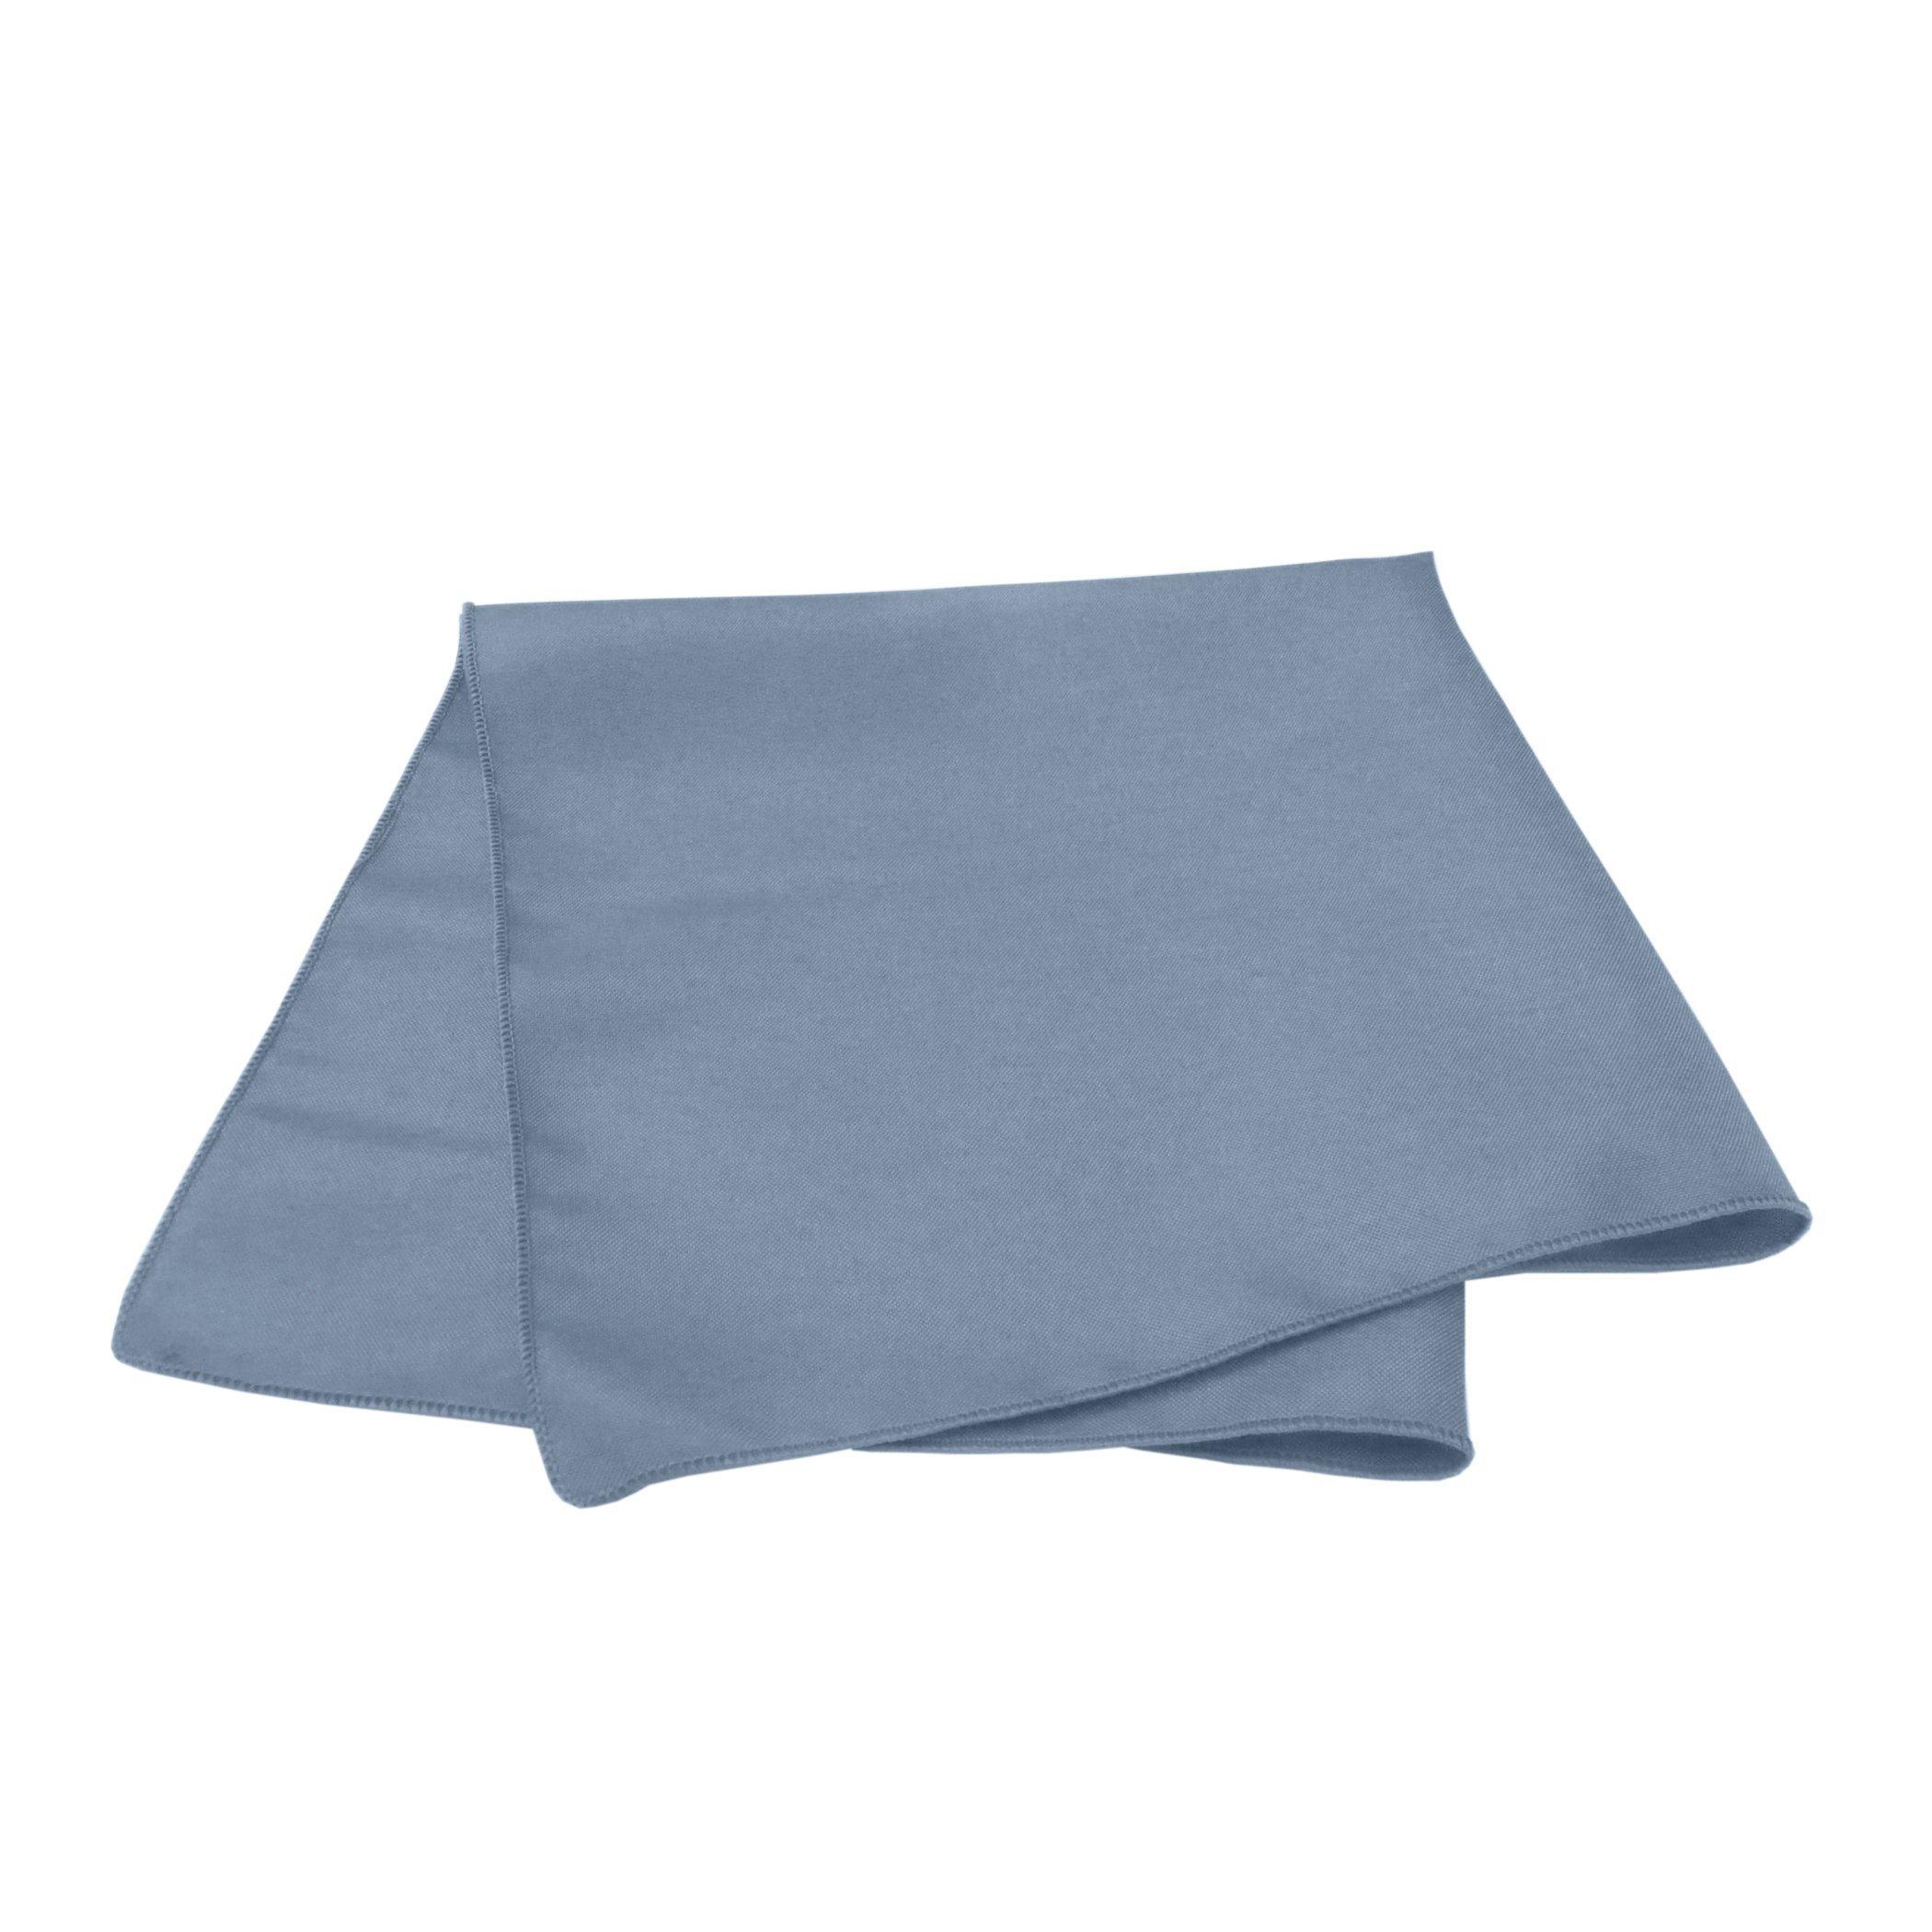 Ultimate Textile -3 Dozen- 10 x 10-Inch Cloth Cocktail Napkins - for Wedding, Restaurant or Banquet use, Slate Blue